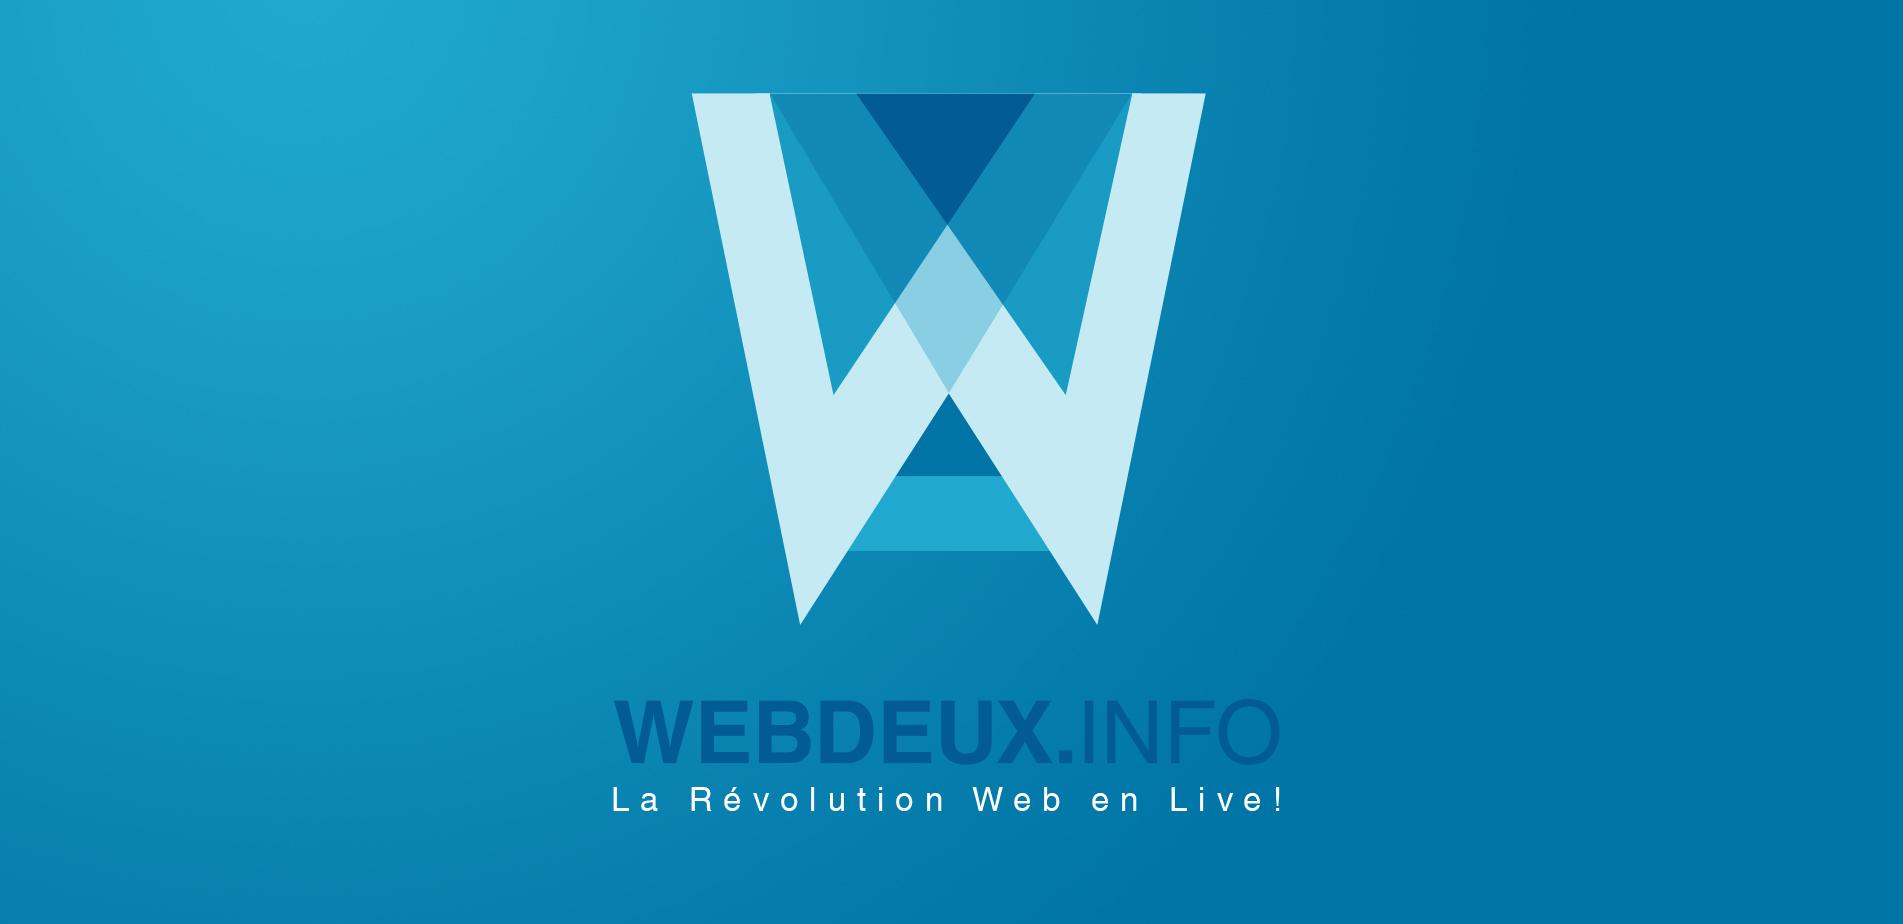 webdeux info